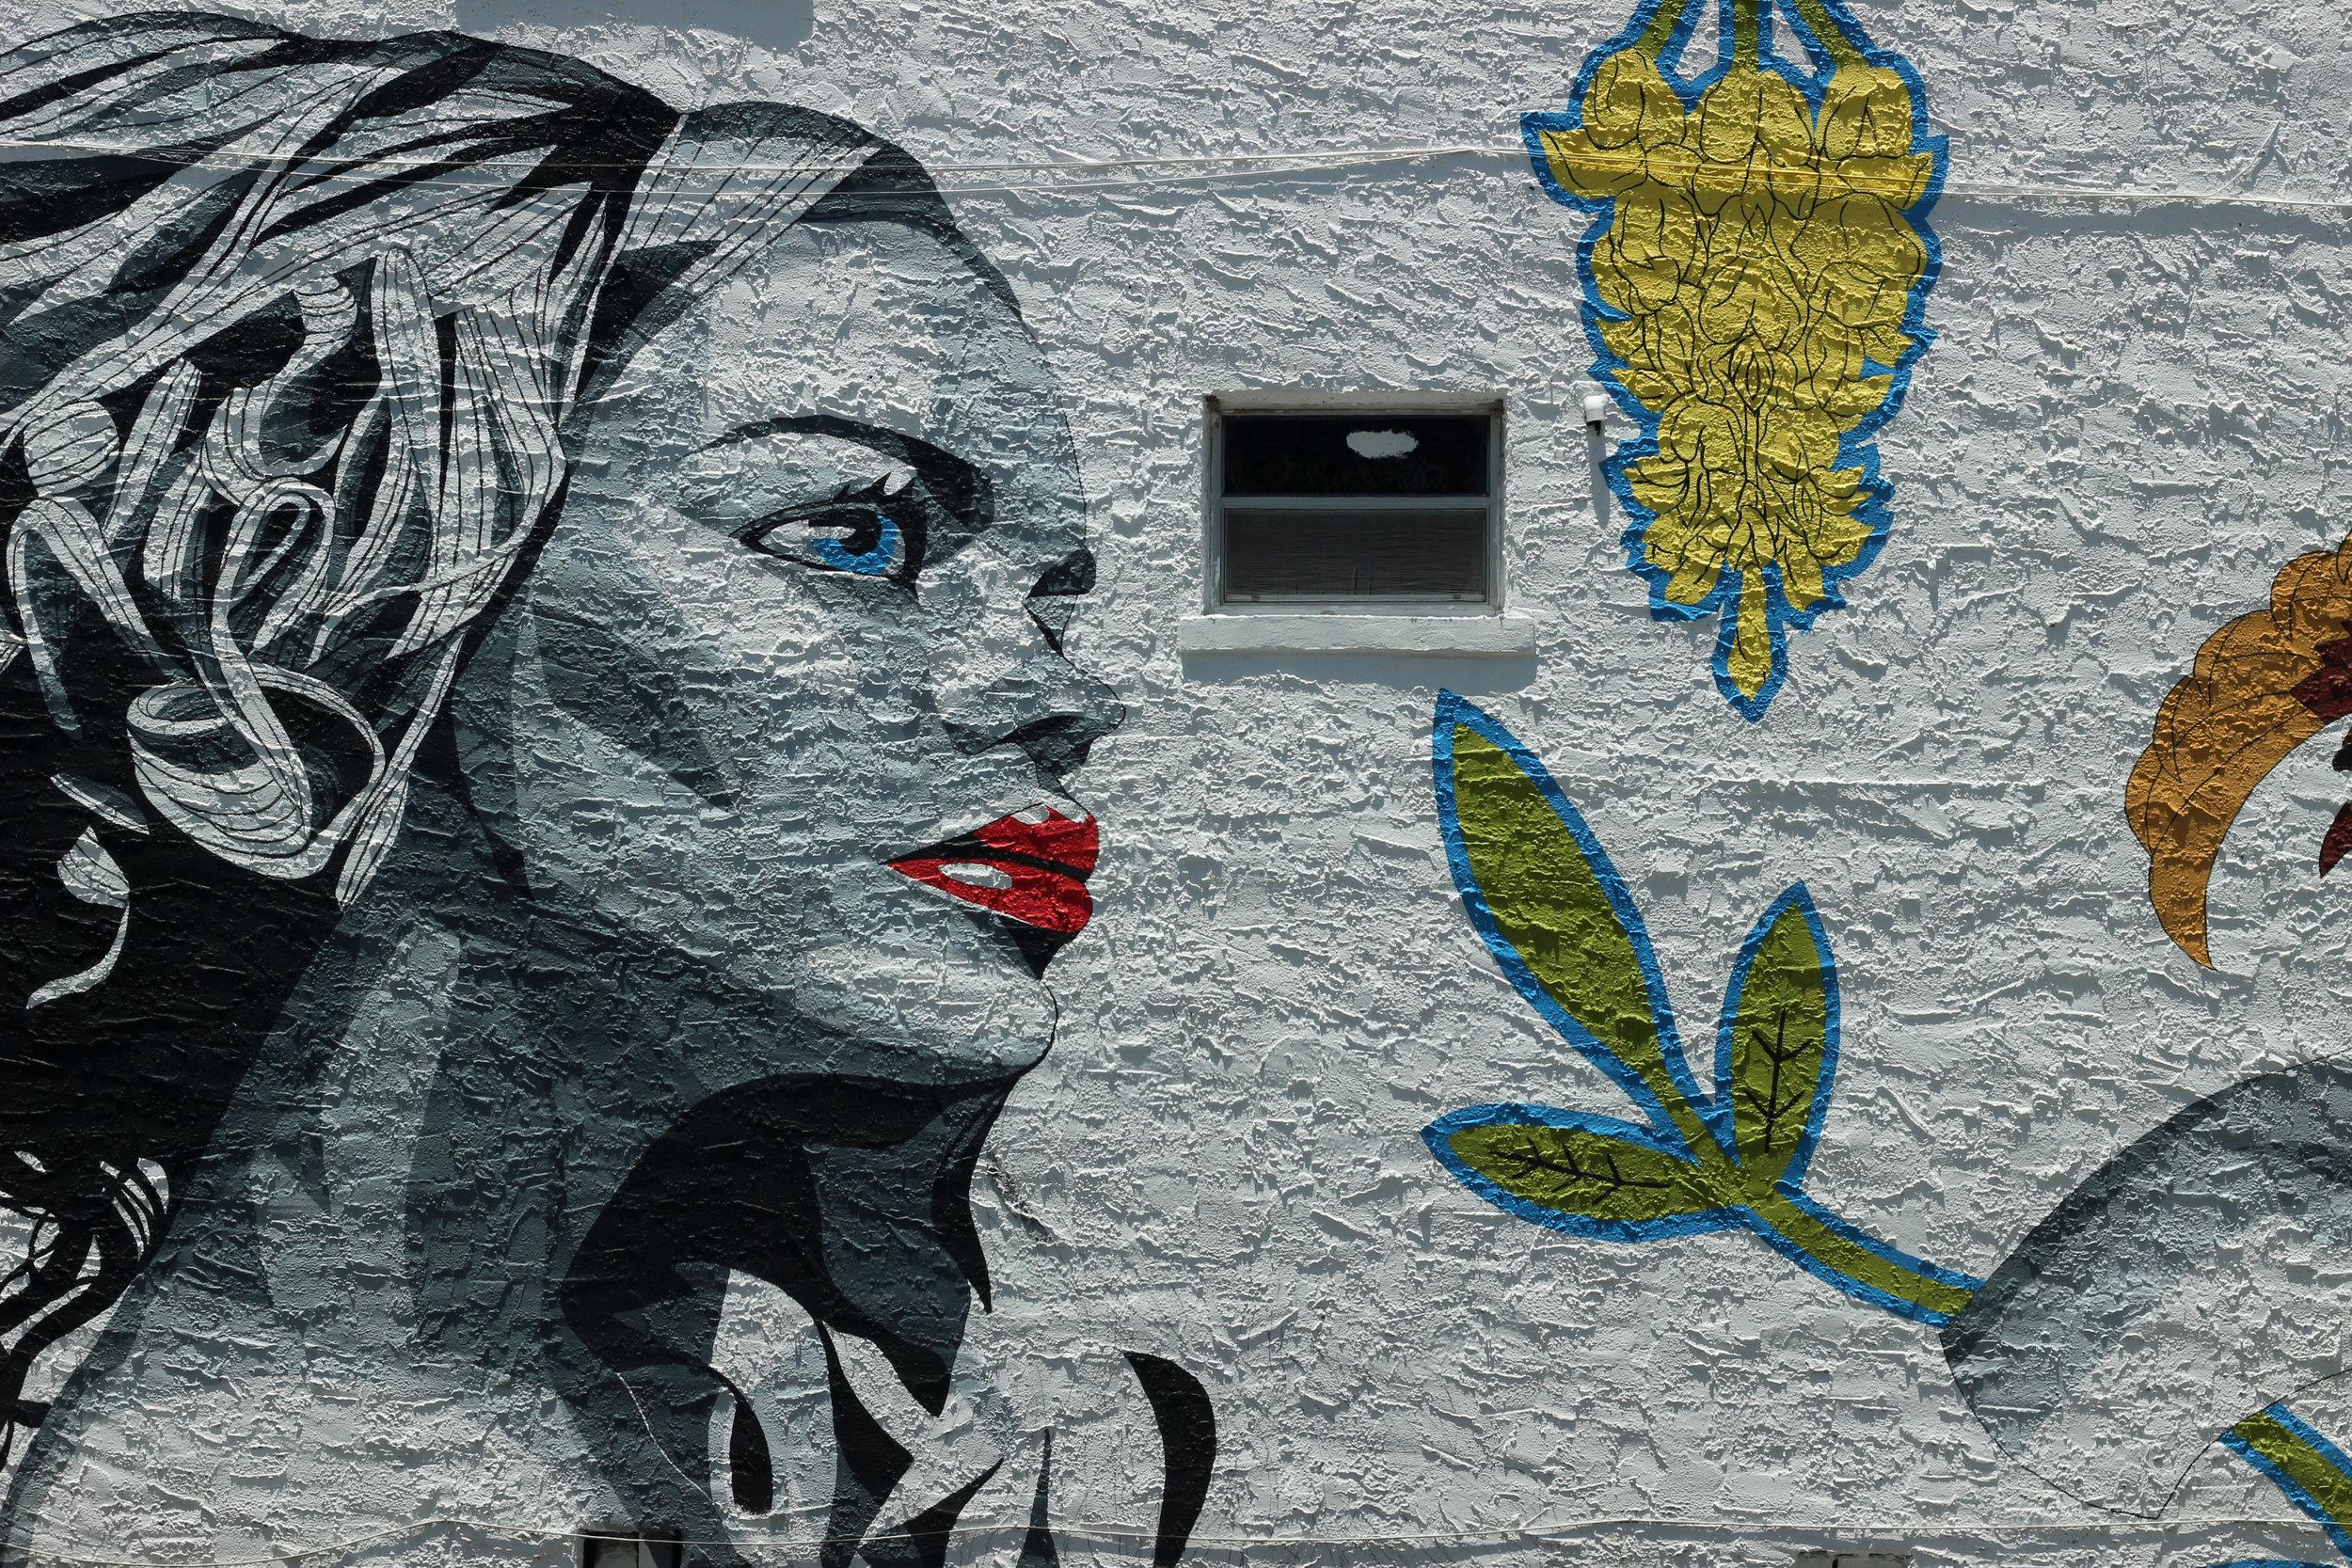 Higland Avenue on the side of Maxine's Salon (Artist Andrew Spear)